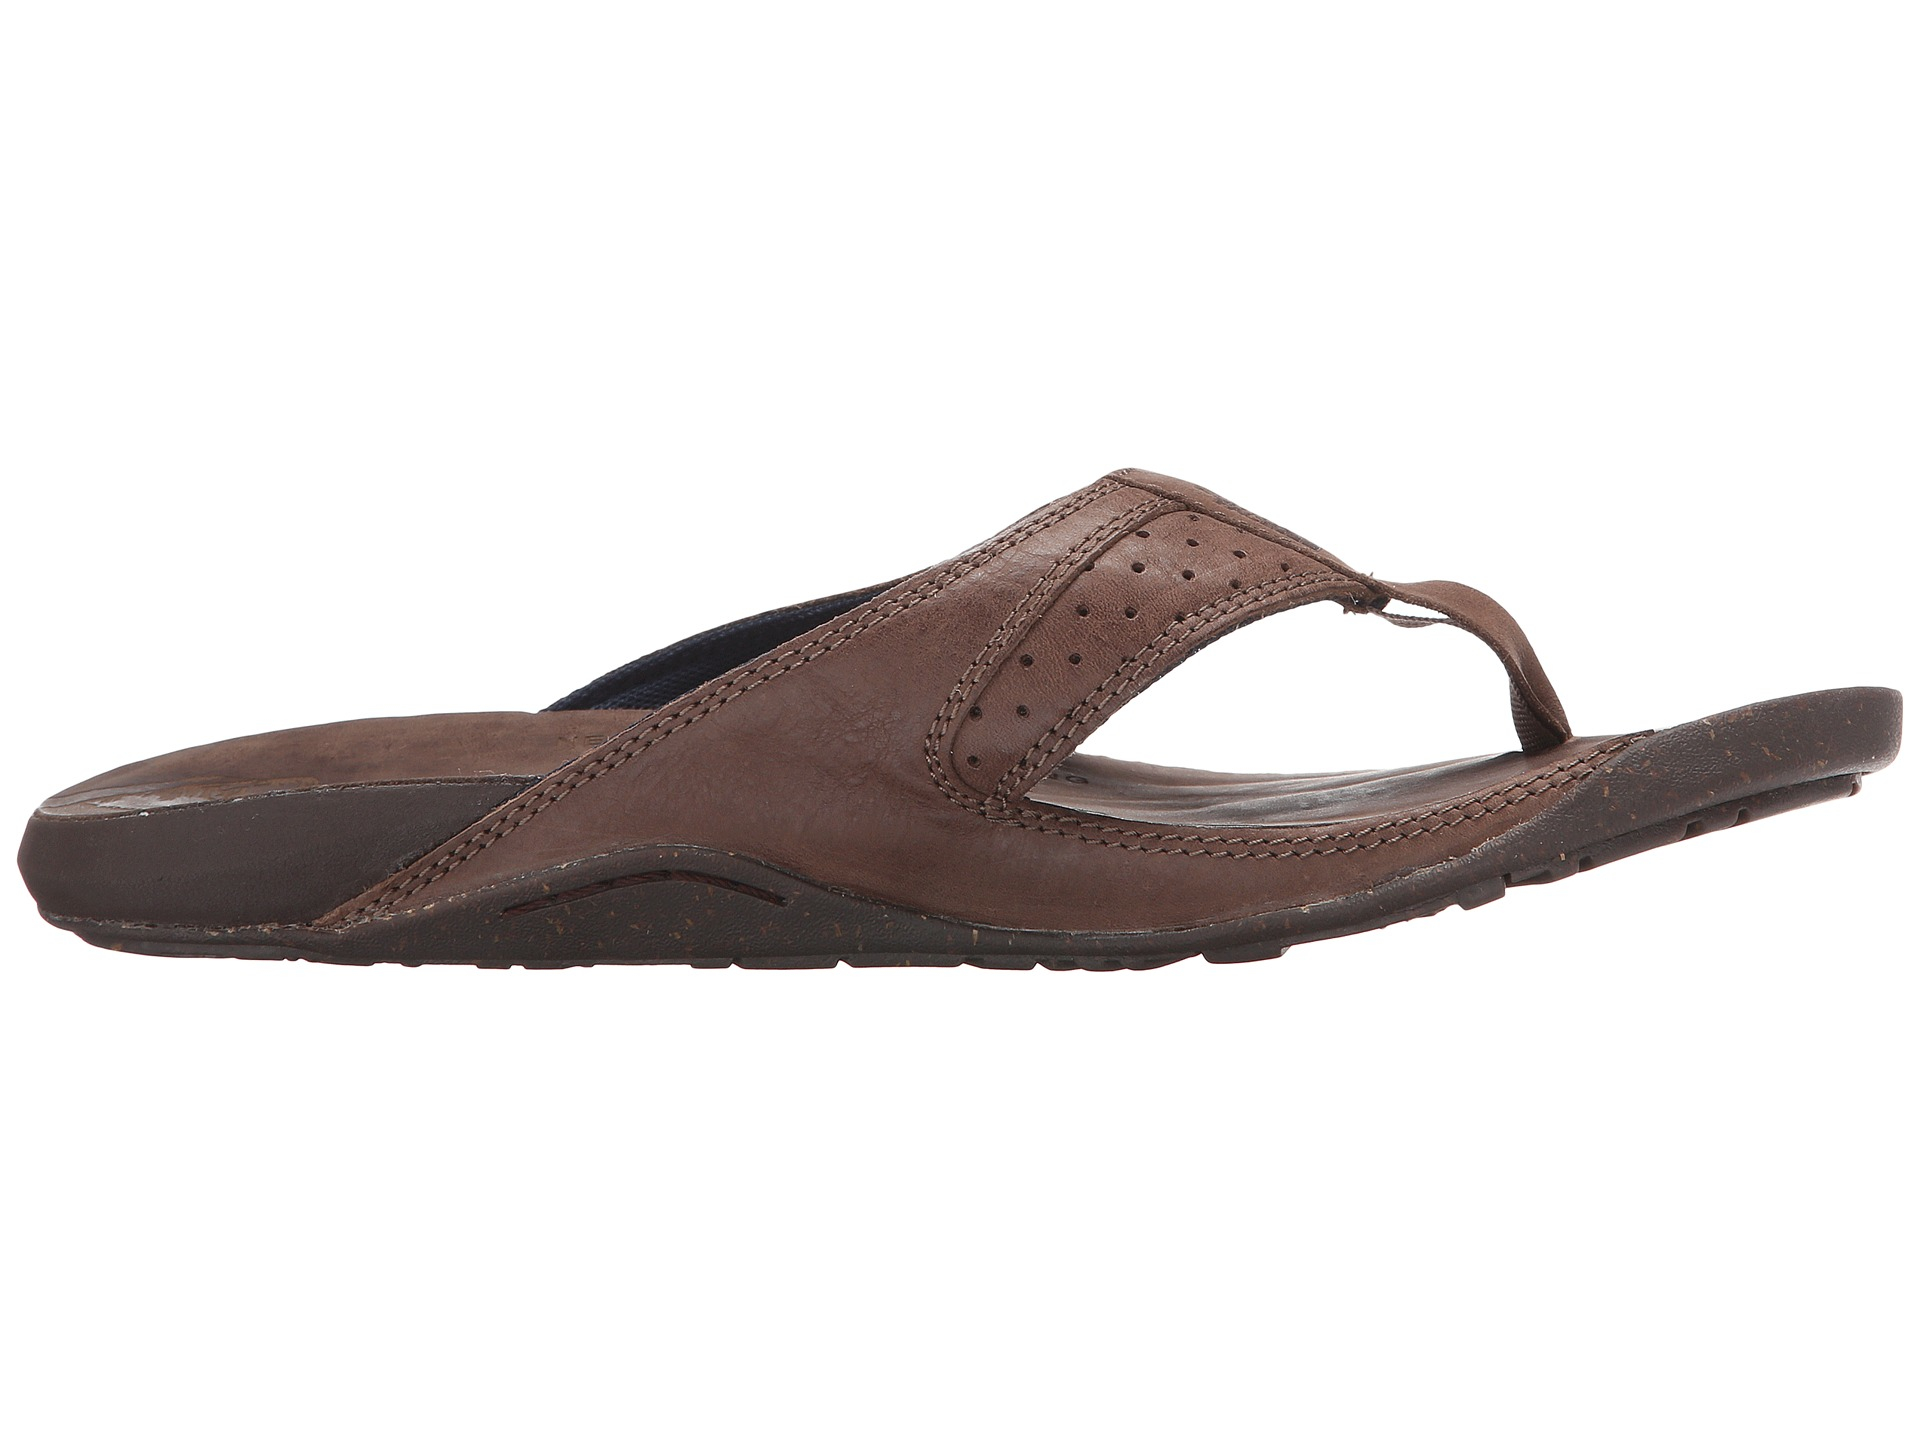 05b5ca138 The North Face Brown Bridgeton Flip Flop for men